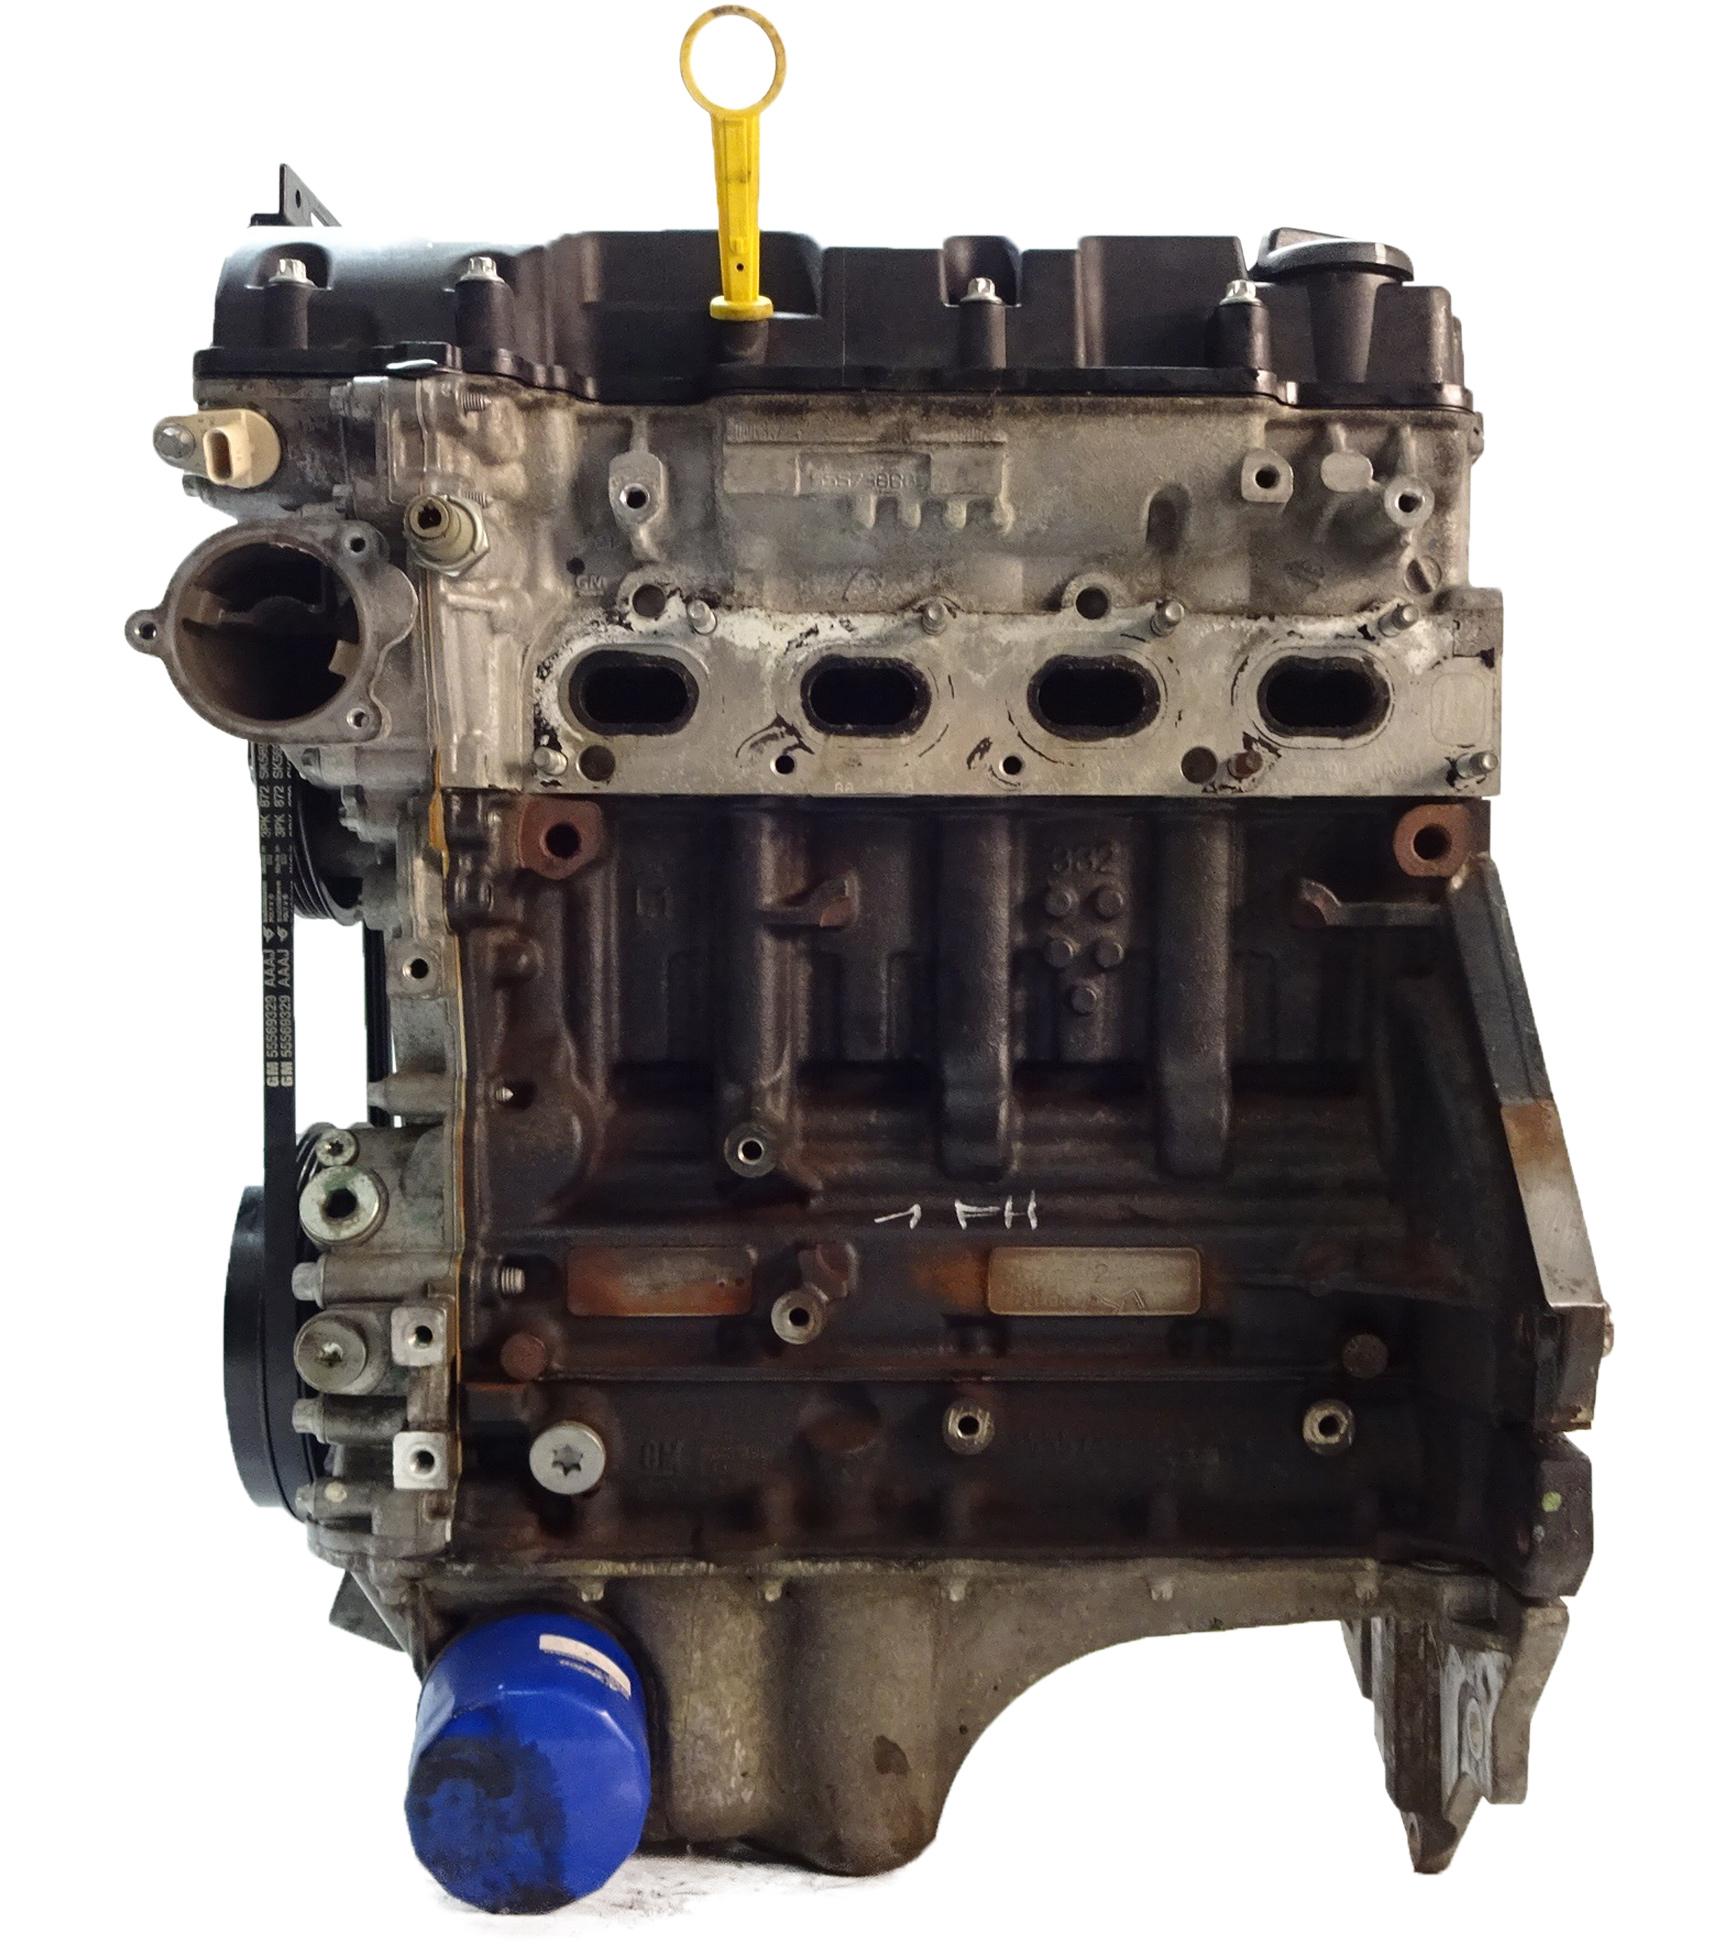 Motor 2013 Opel 1,4 Hybrid A14XFL A14 151 PS